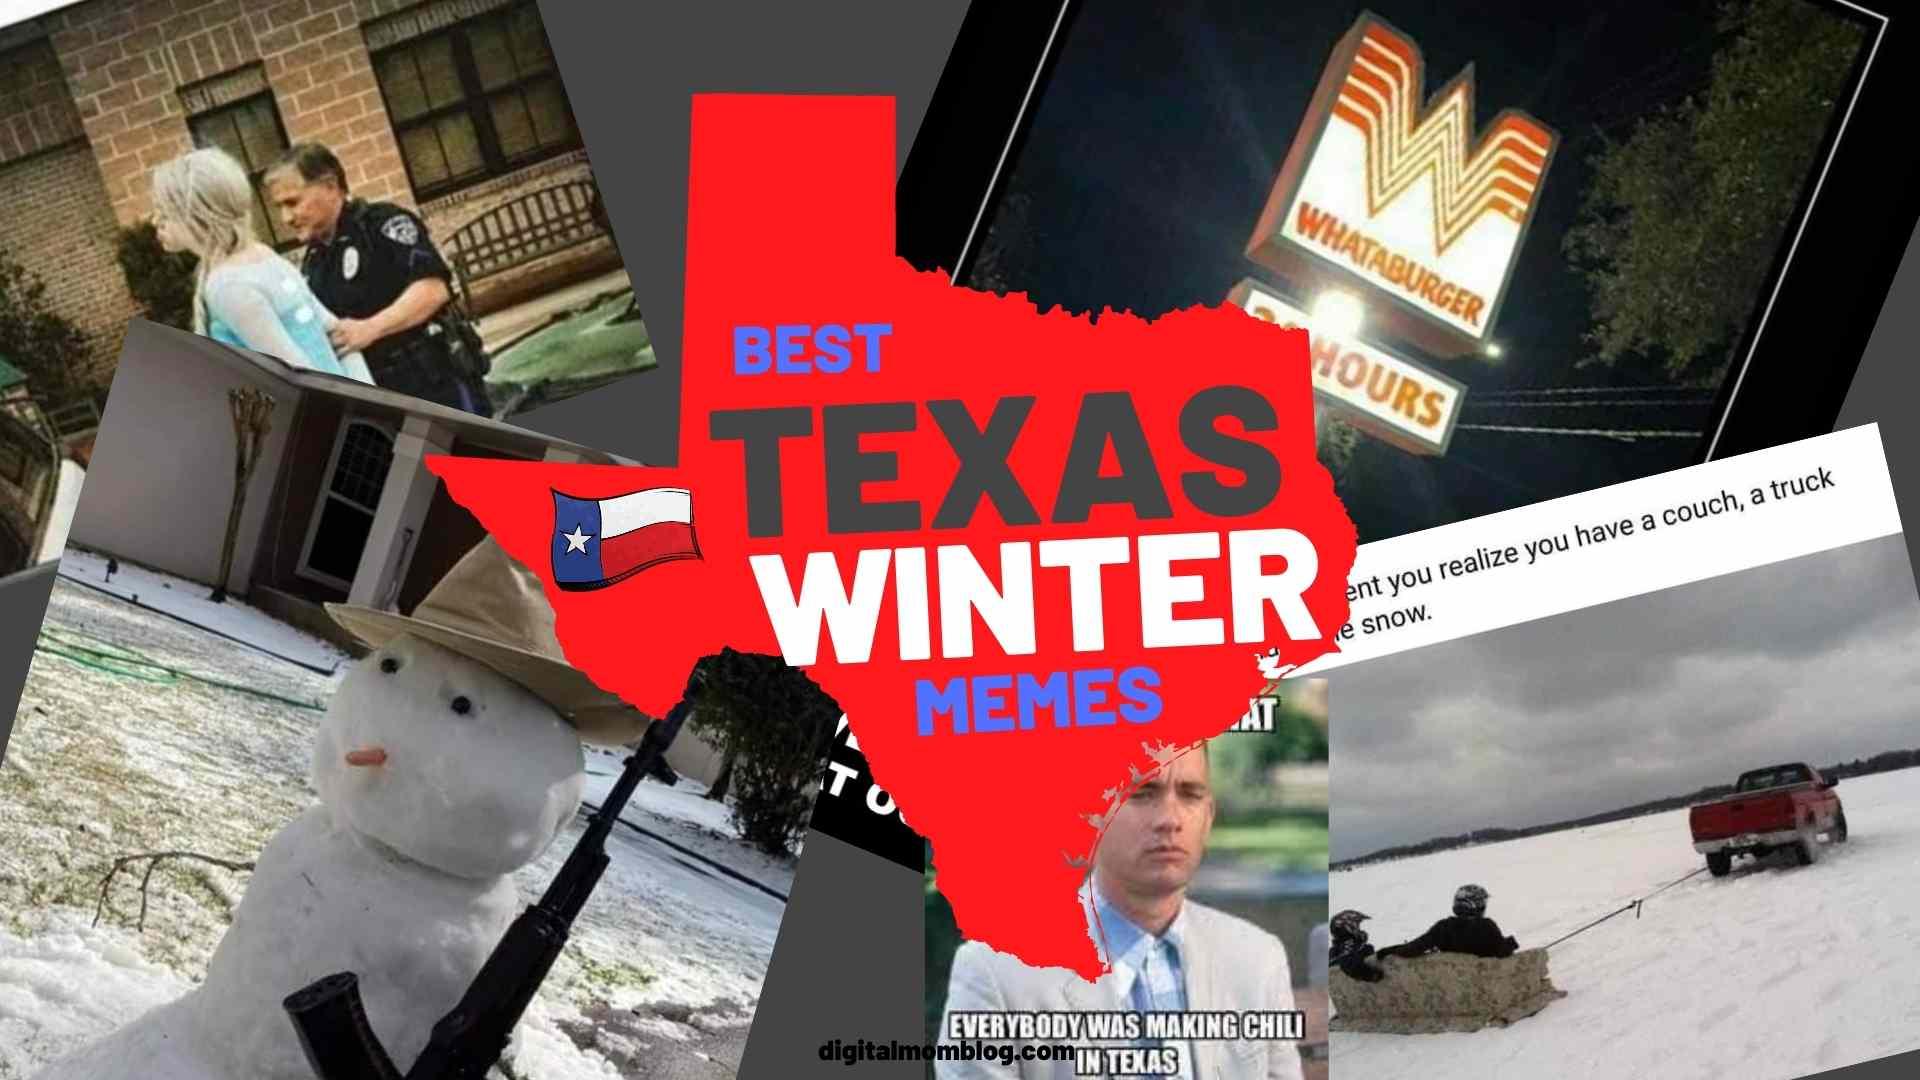 texas winter memes snow humor